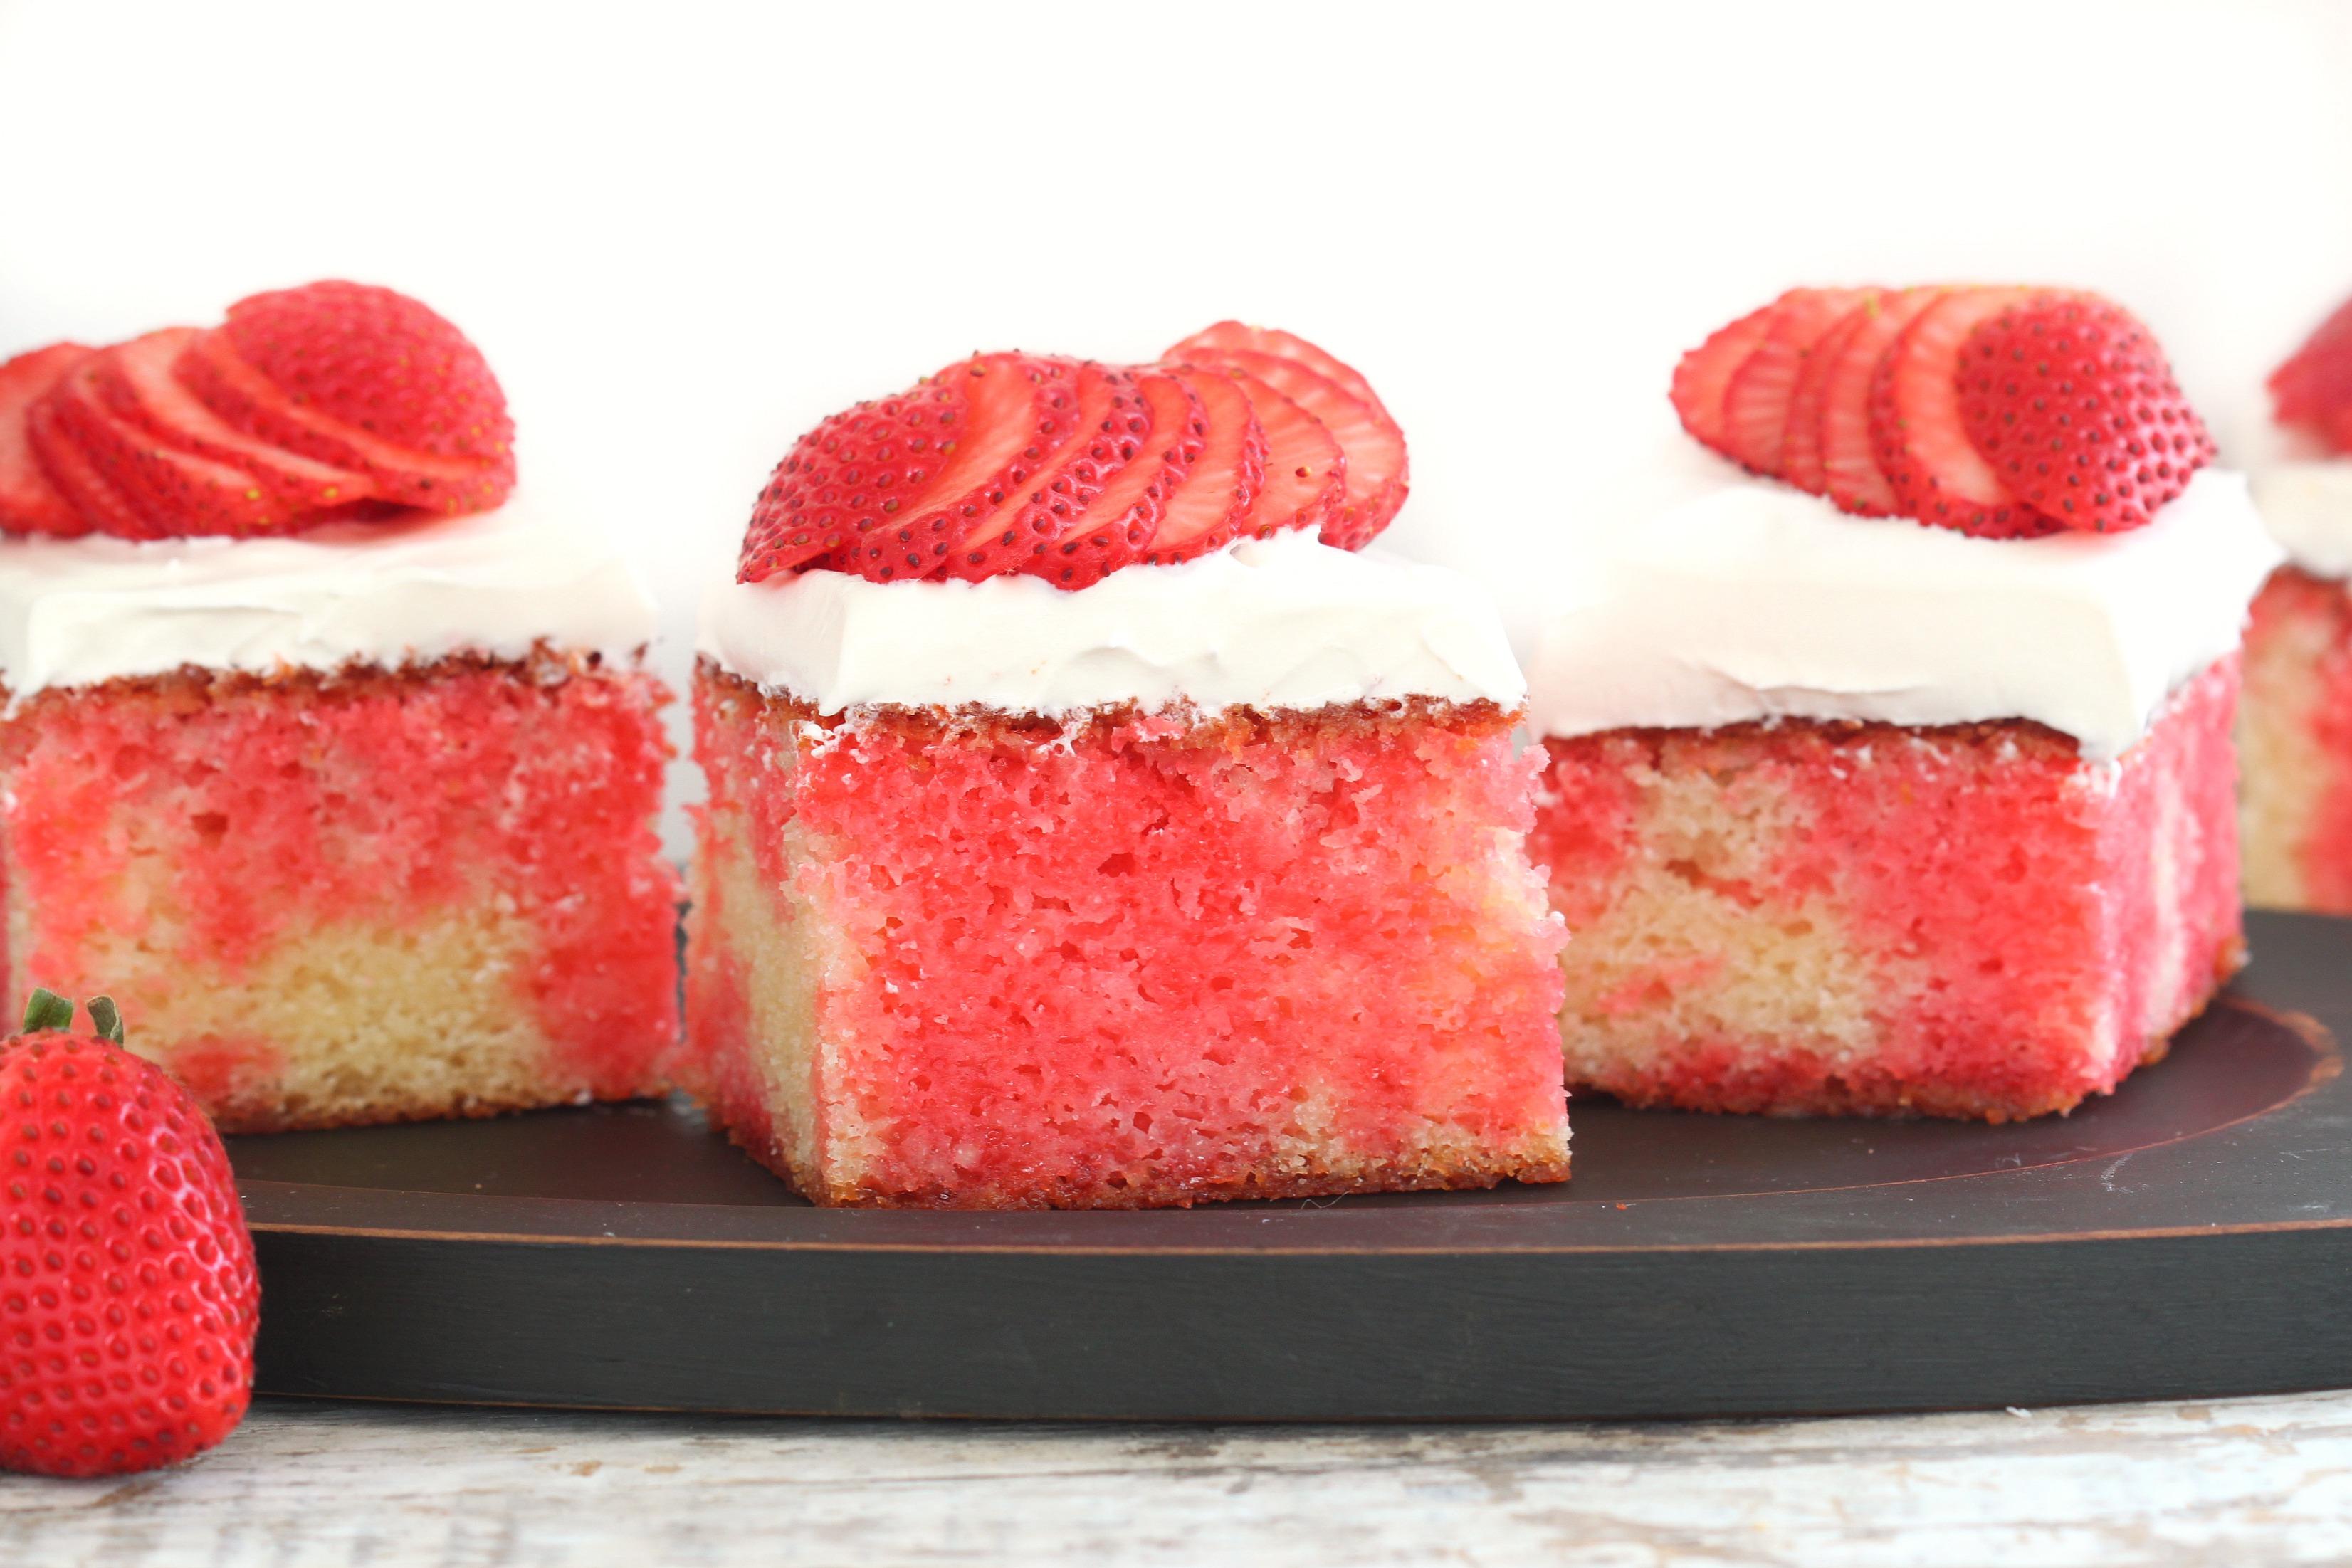 Imperial Sugar Strawberry Cake Recipe